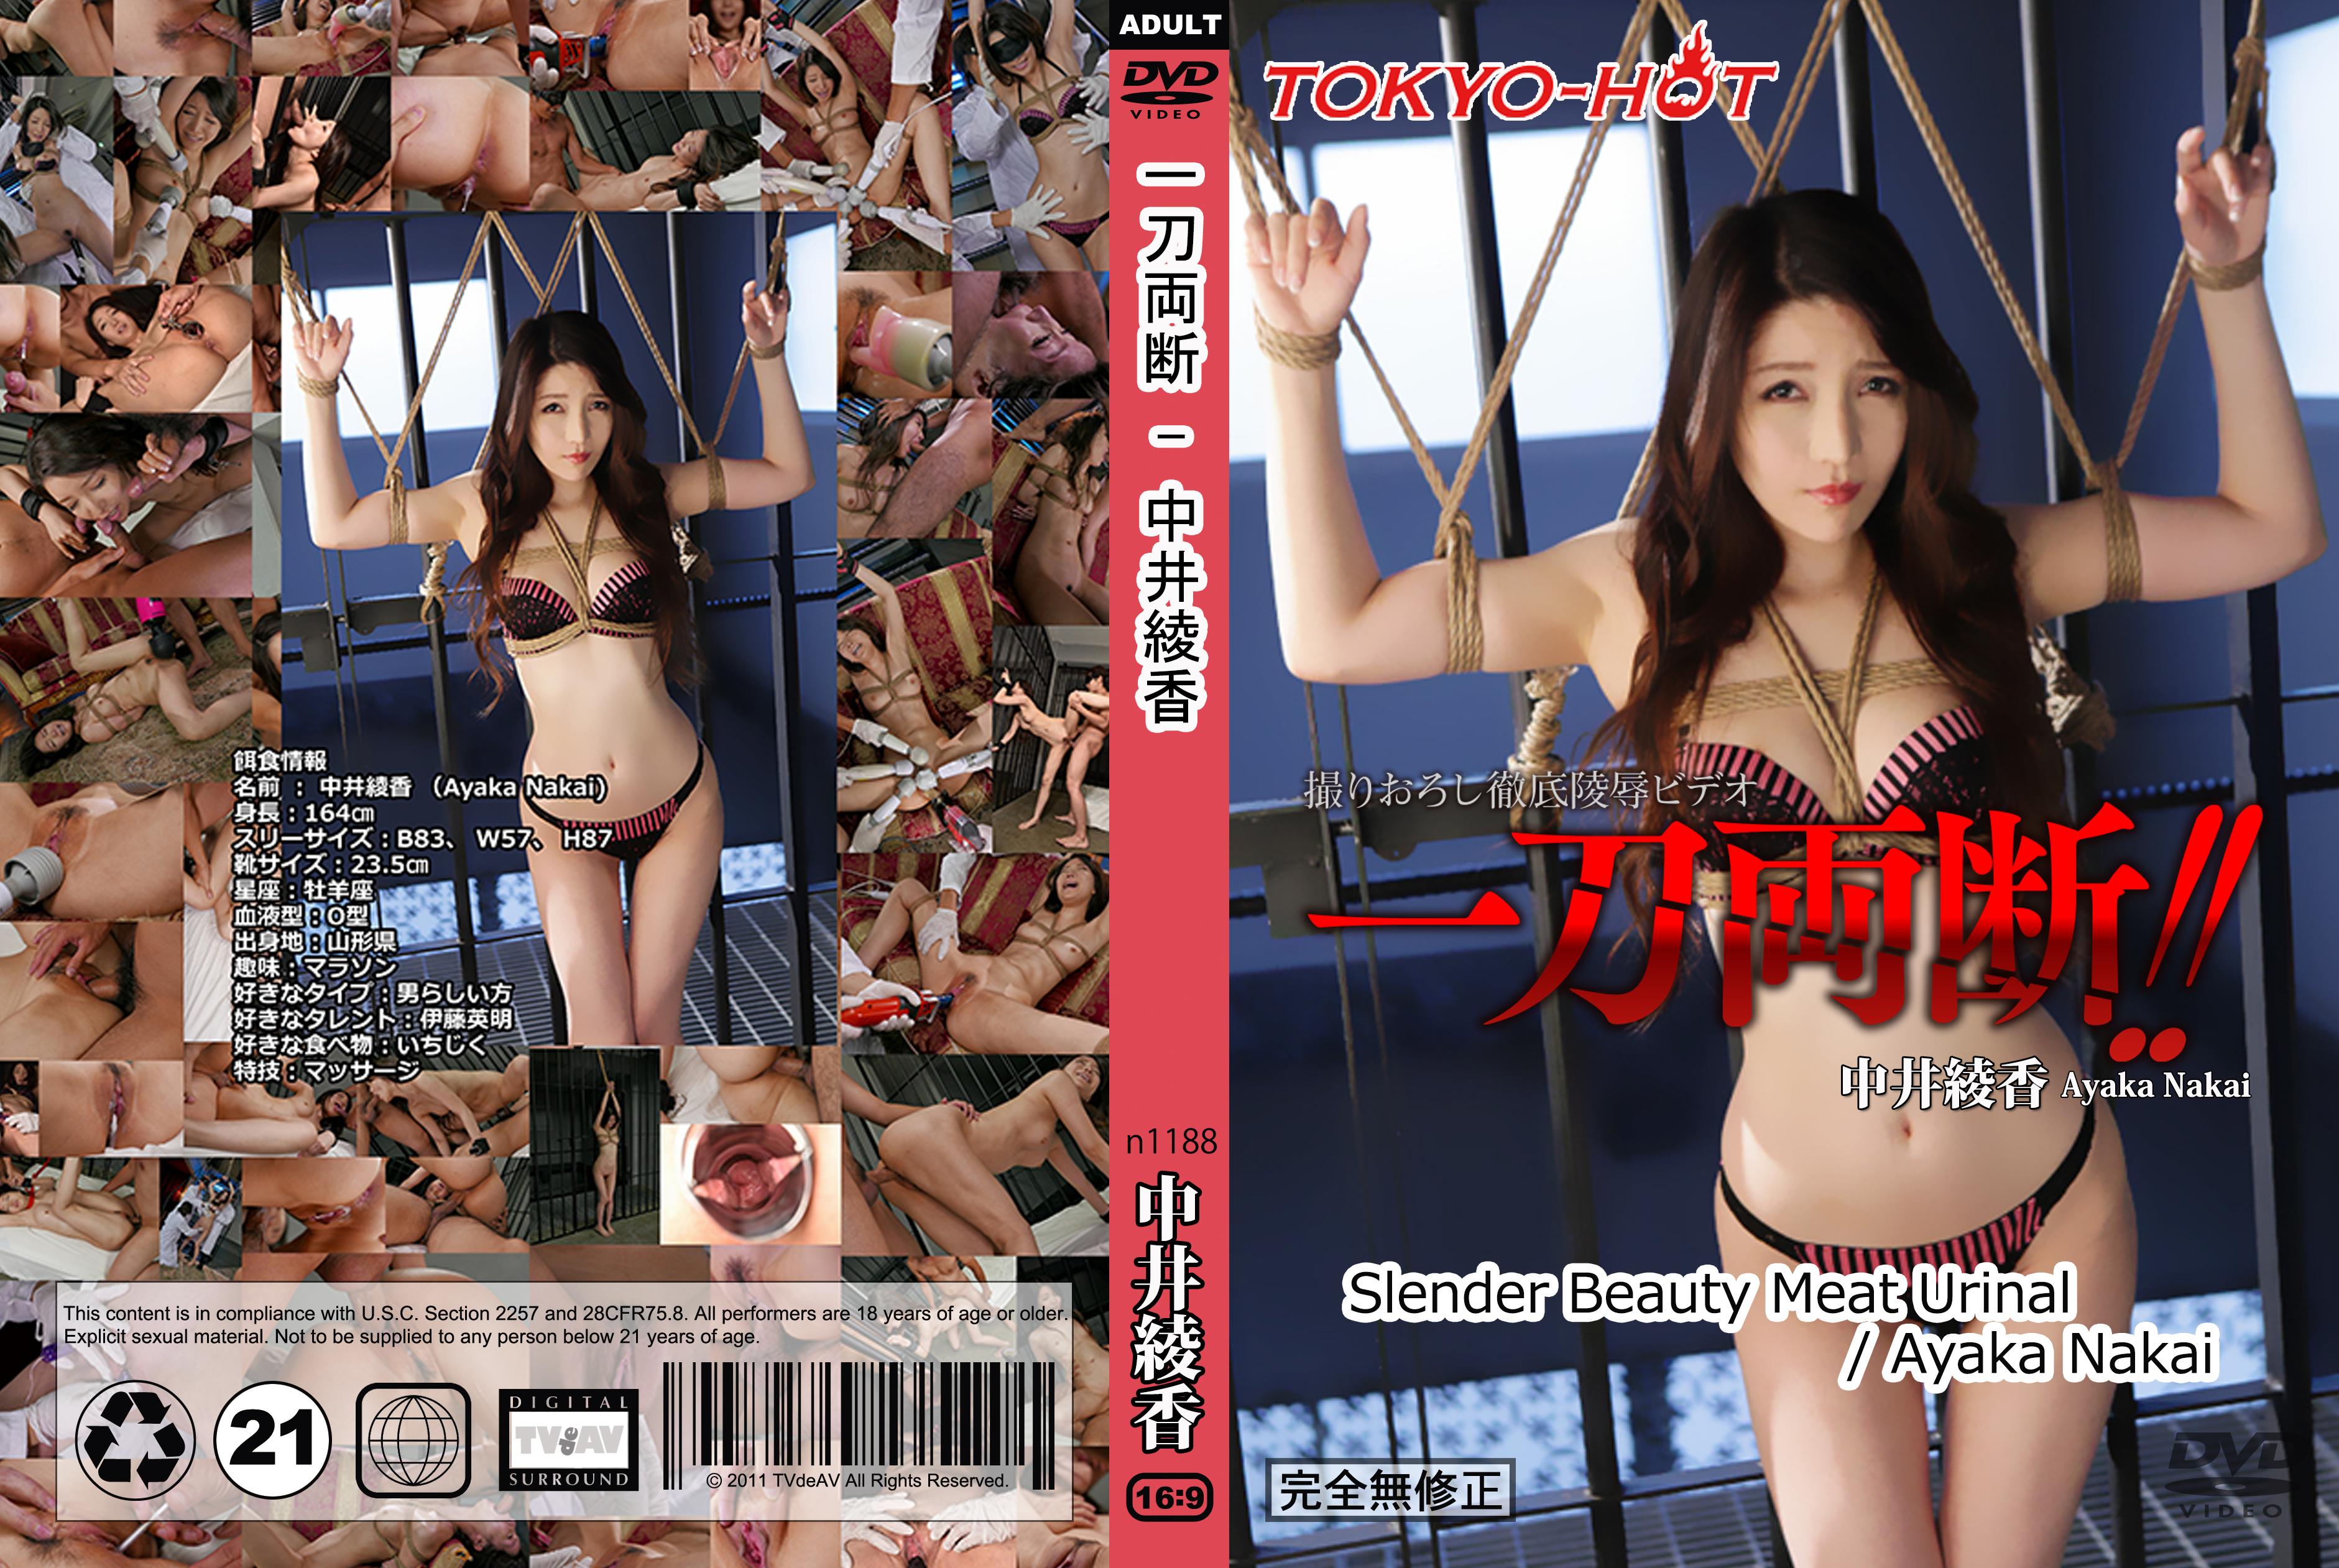 Slender Beauty Meat Urinal  Ayaka Nakai